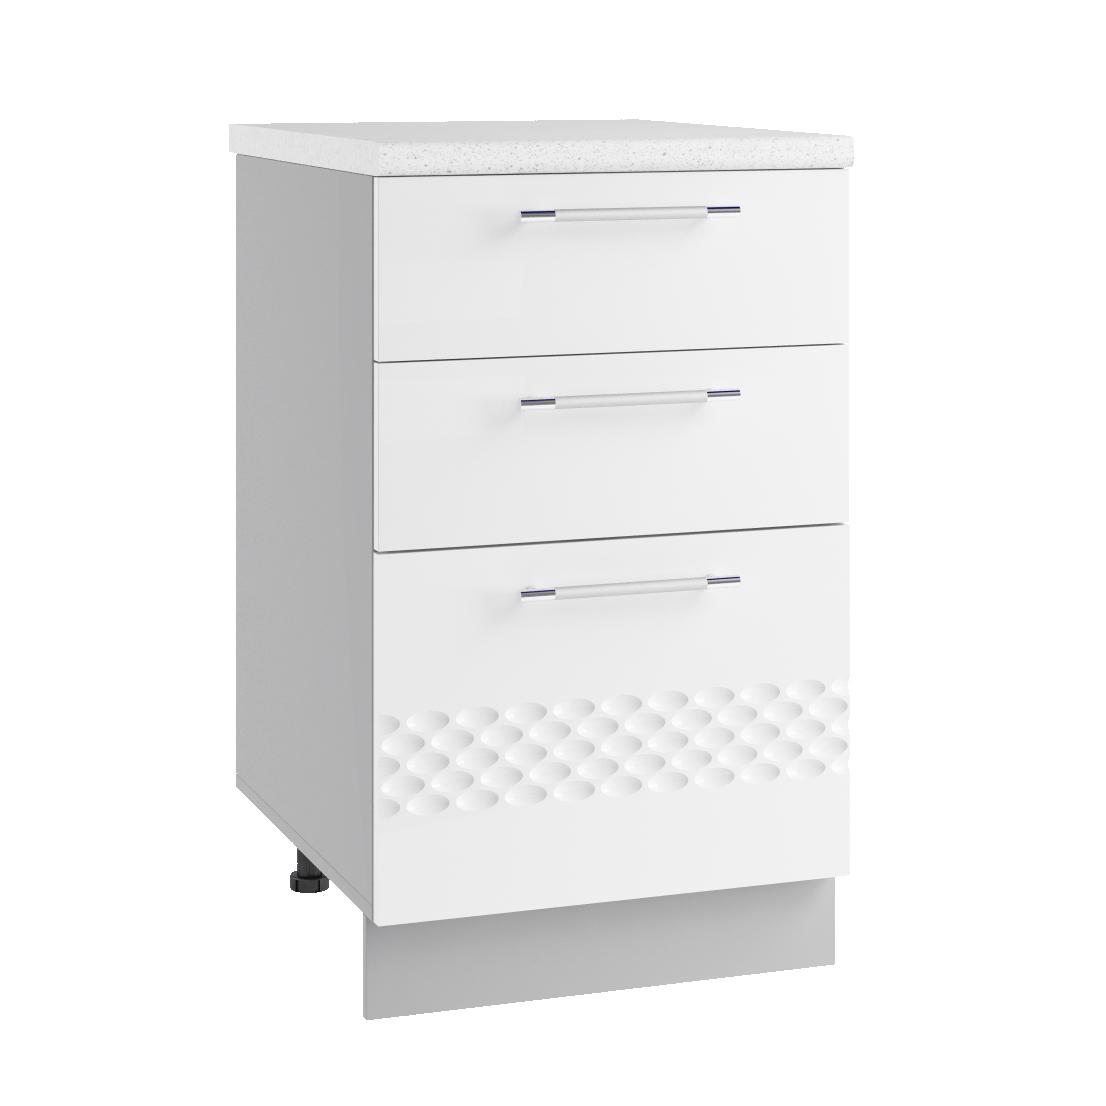 Кухня Капля 3D СЯ 500 Шкаф нижний ящики